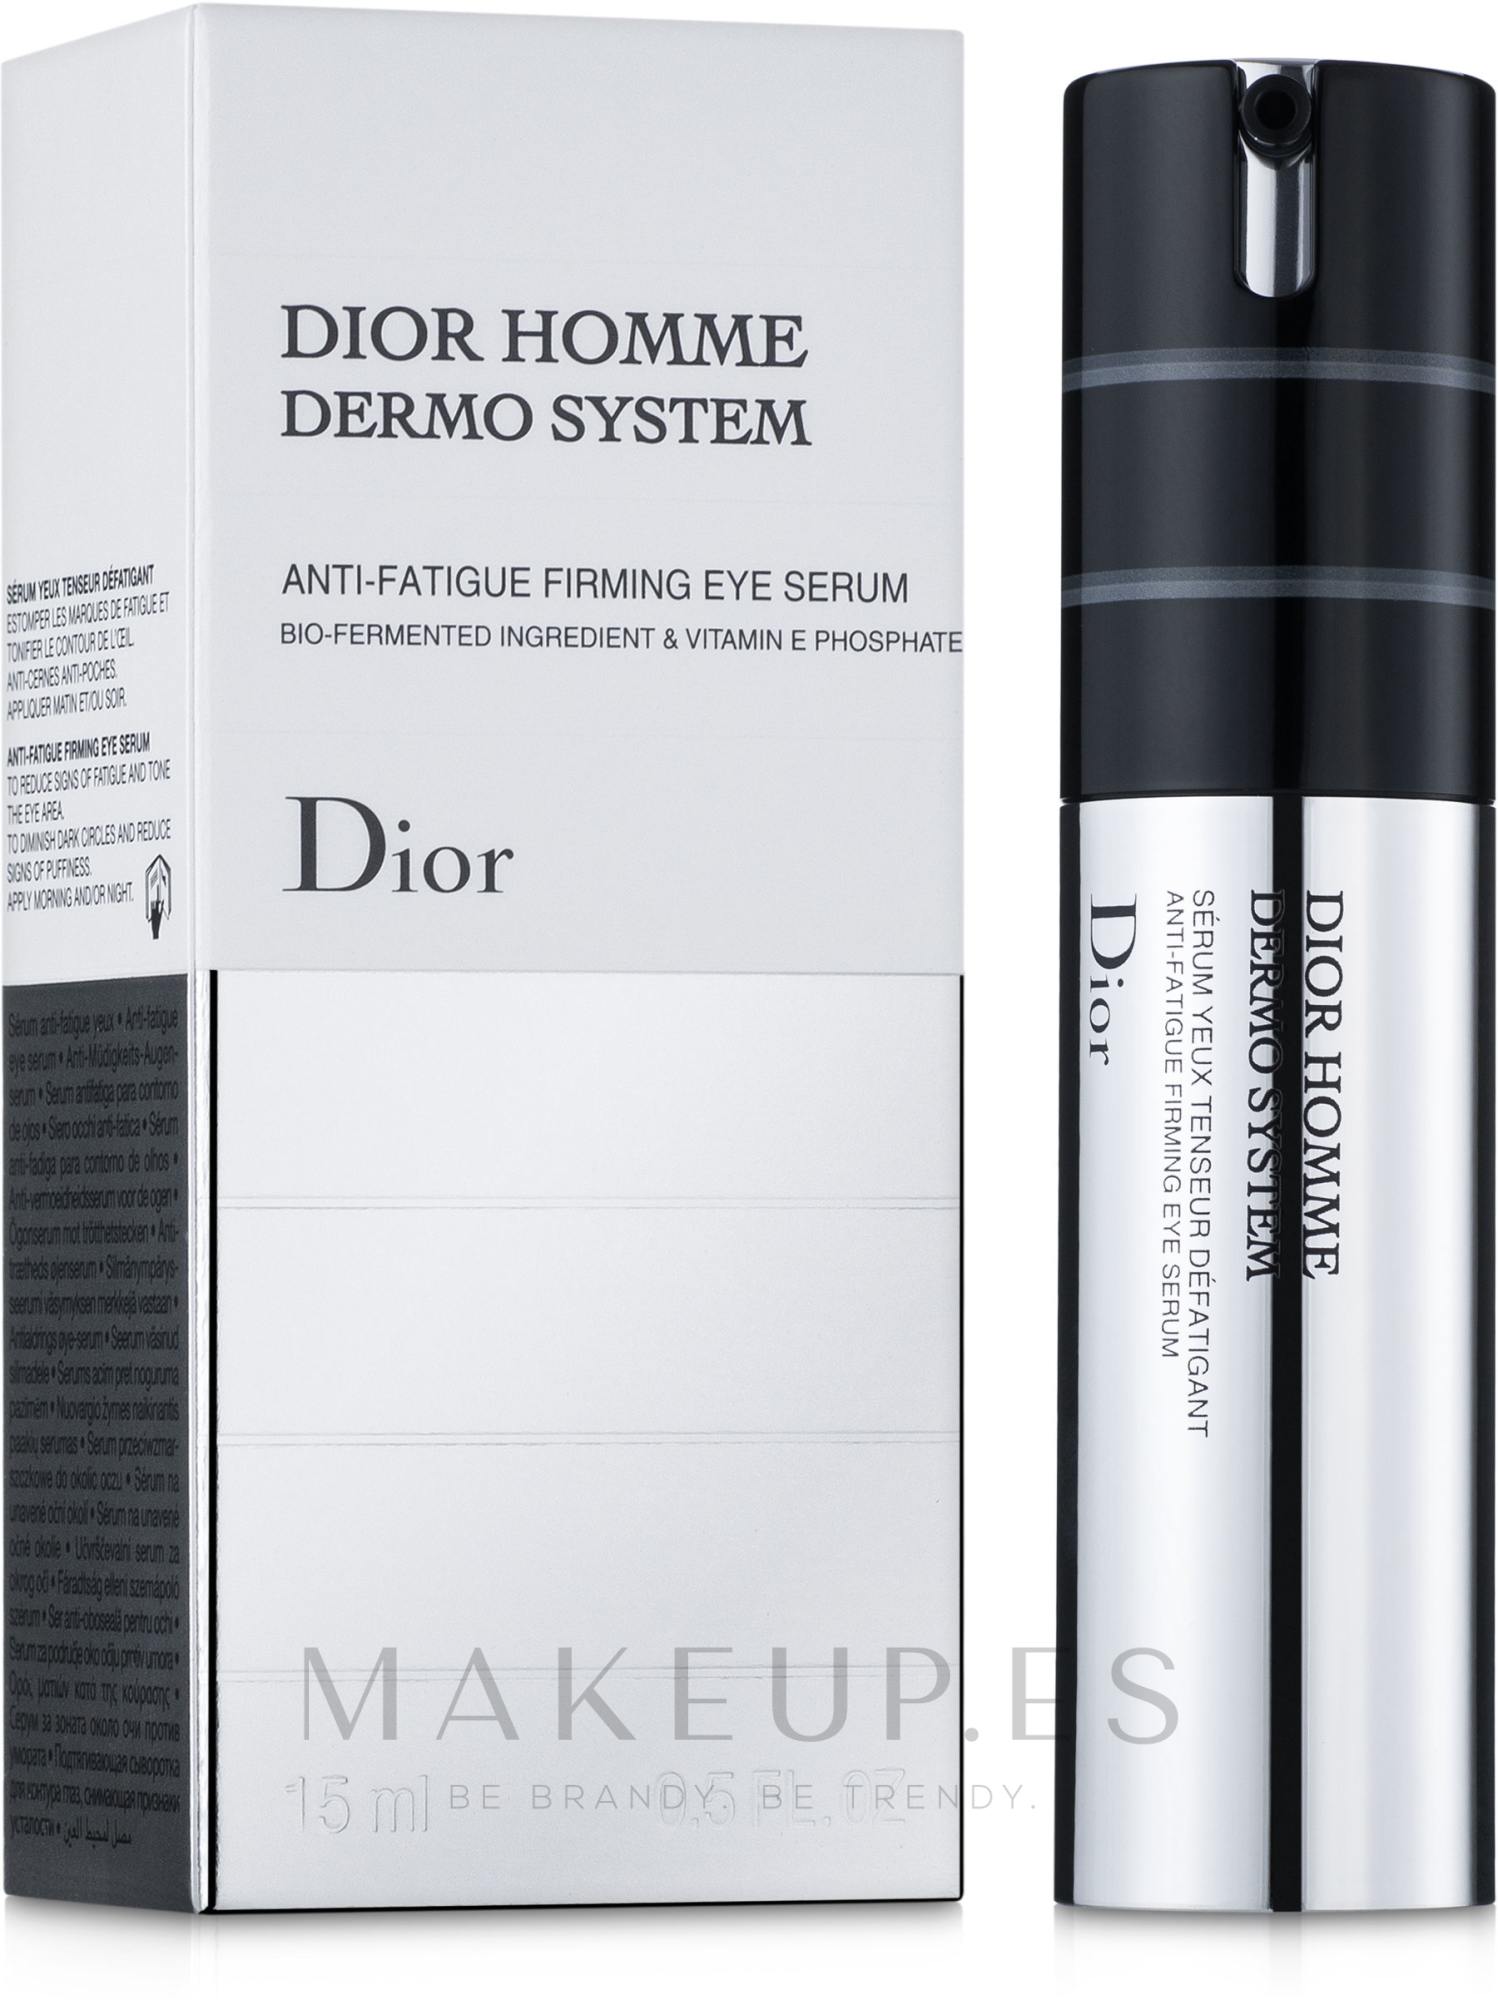 Sérum para contorno de ojos con vitamina E y extracto de avena - Dior Homme Dermo System Eye Serum 15ml — imagen 15 ml